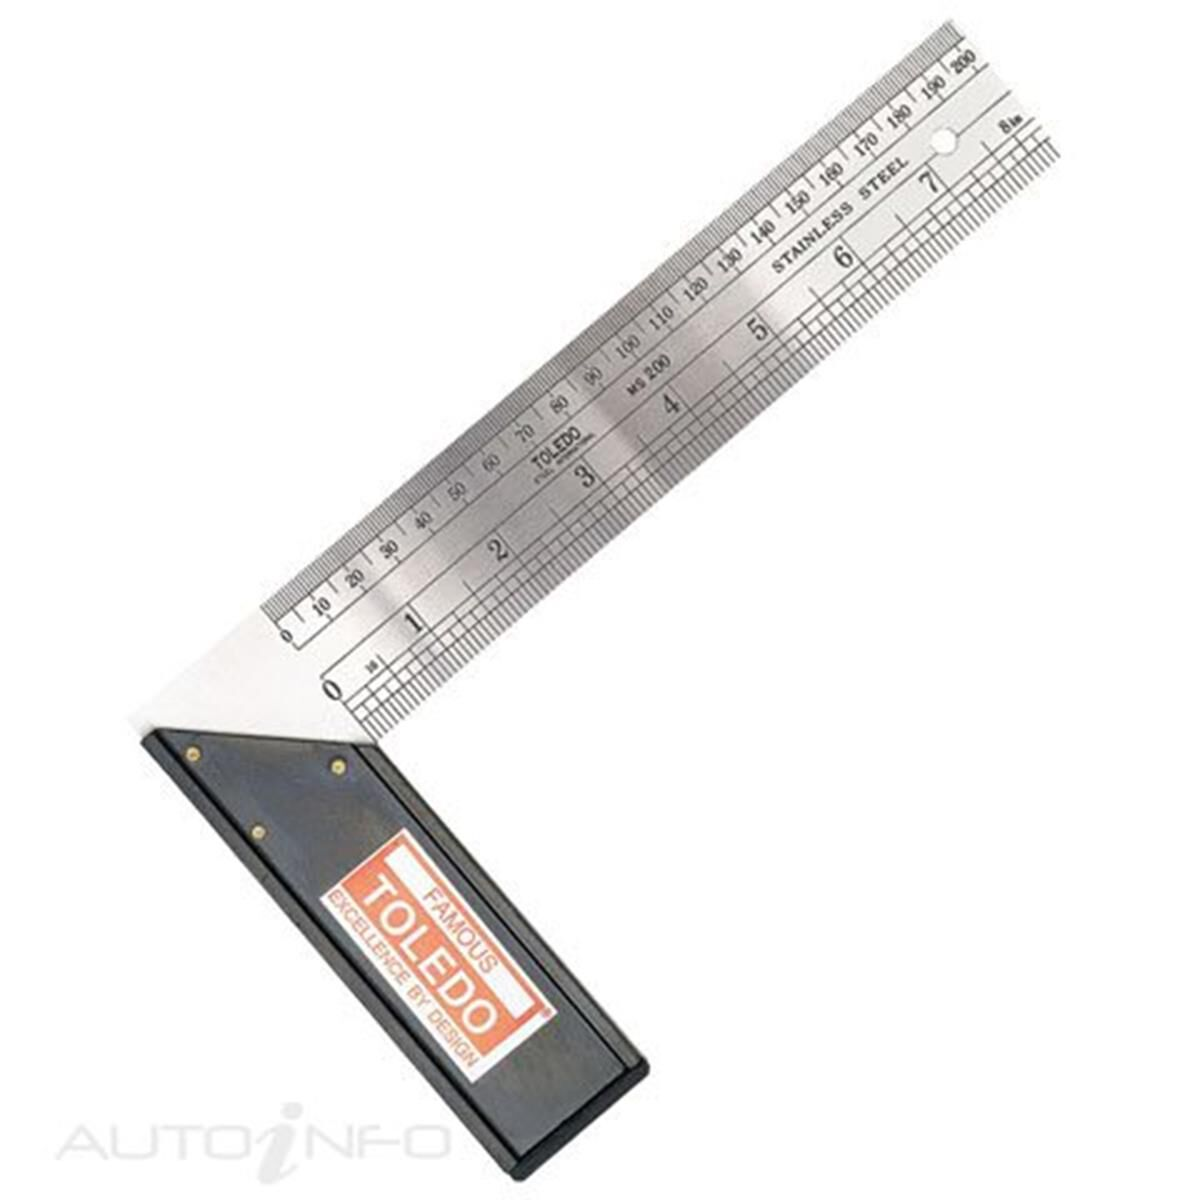 TOLEDO Flat File Smooth 250mm 10FL03CD